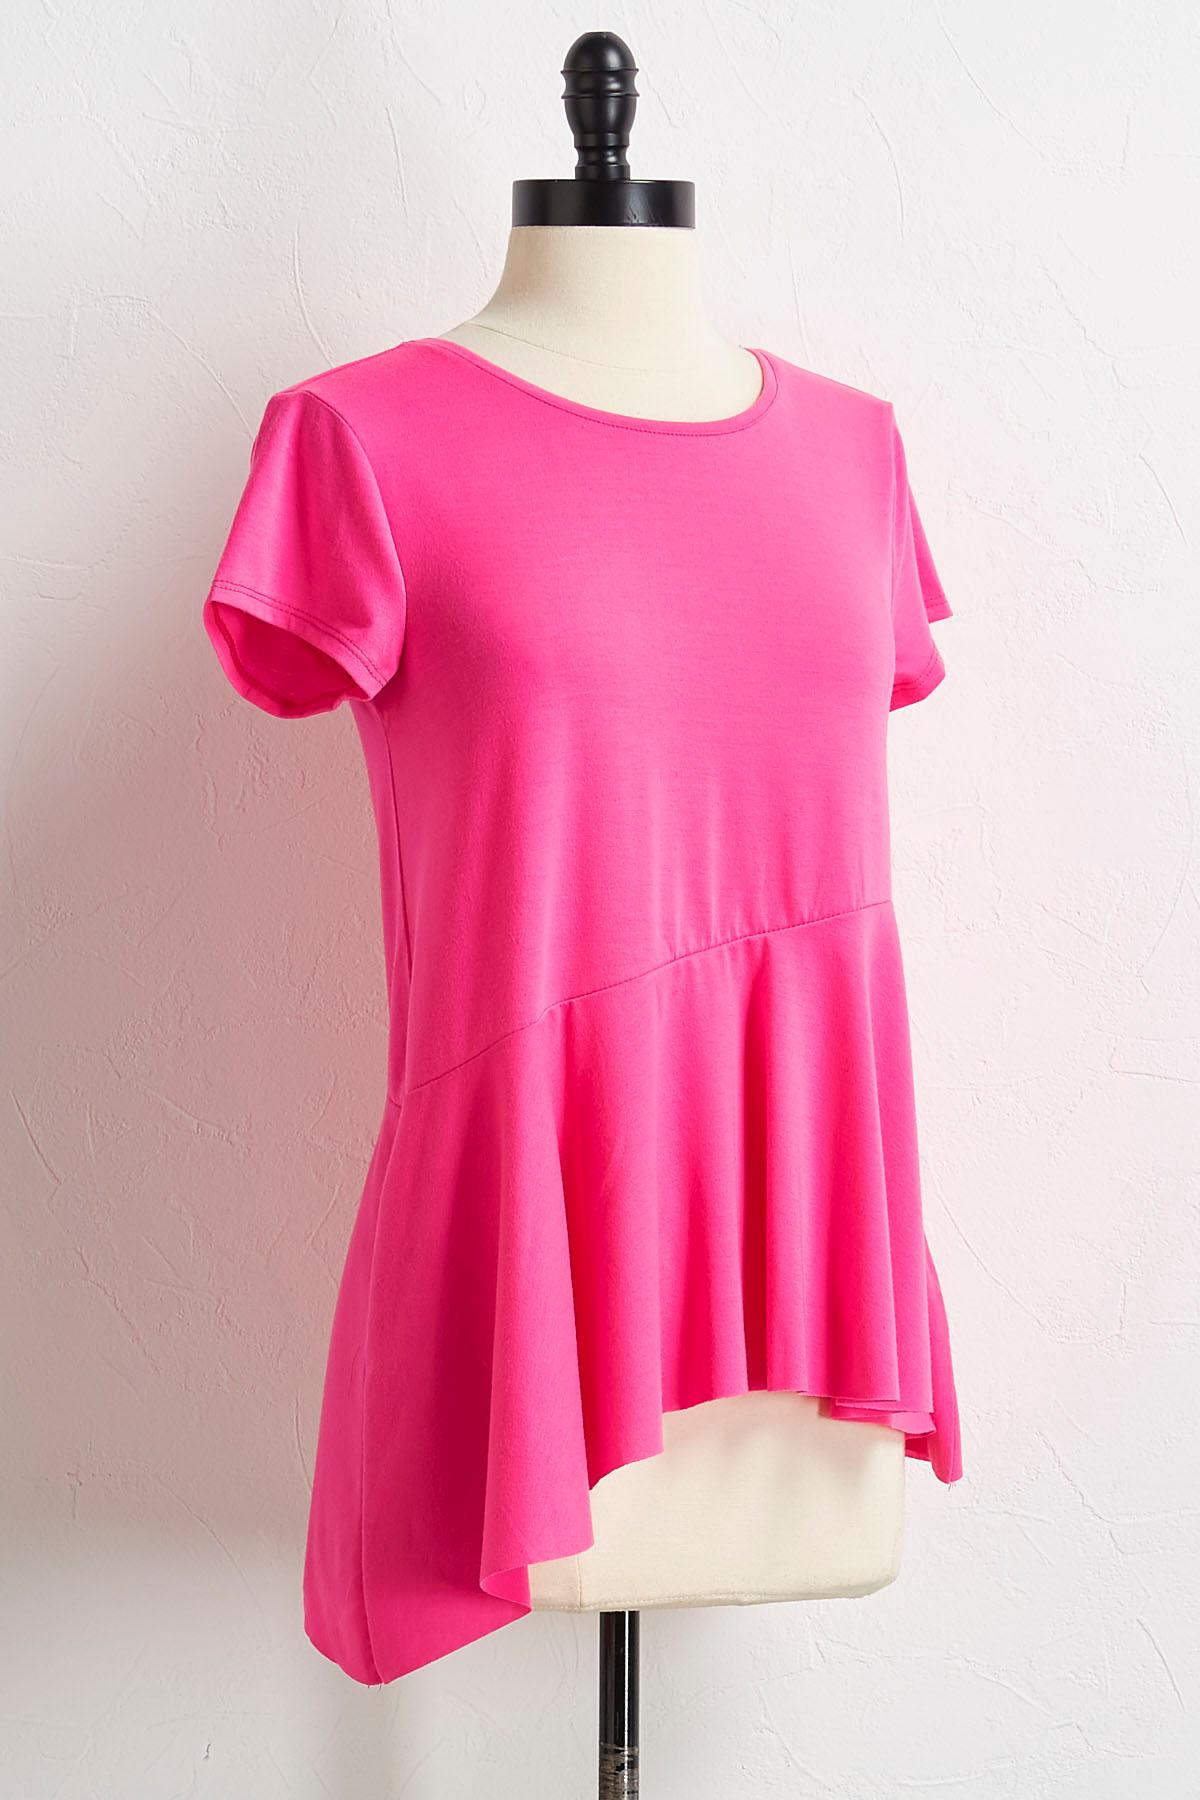 Hot Pink Asymmetrical Top